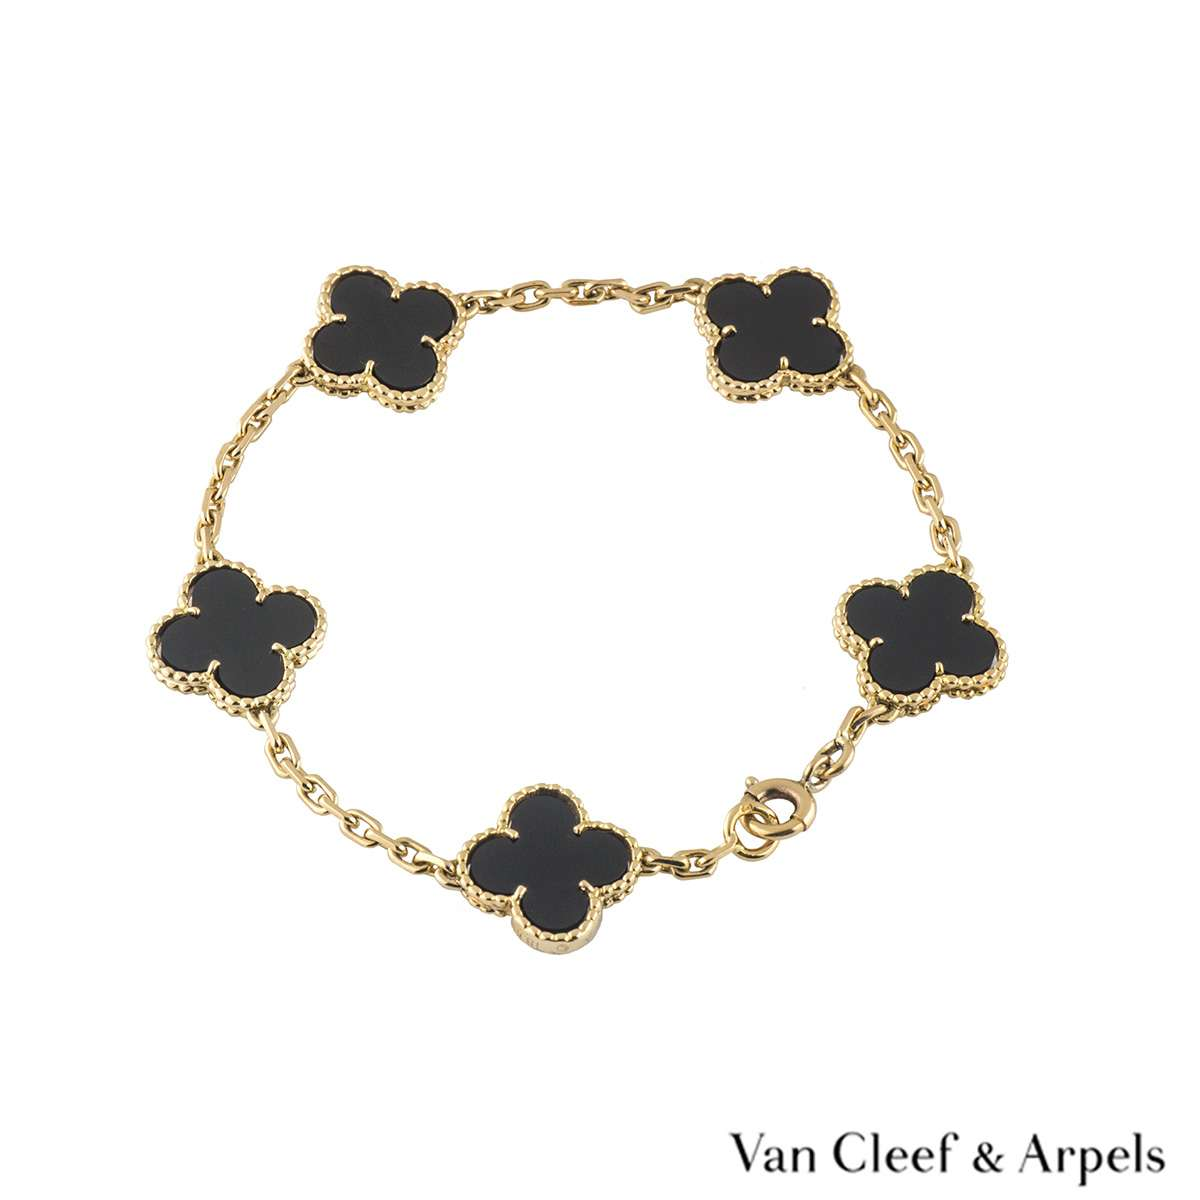 Van Cleef & Arpels Yellow Gold Onyx Alhambra Bracelet